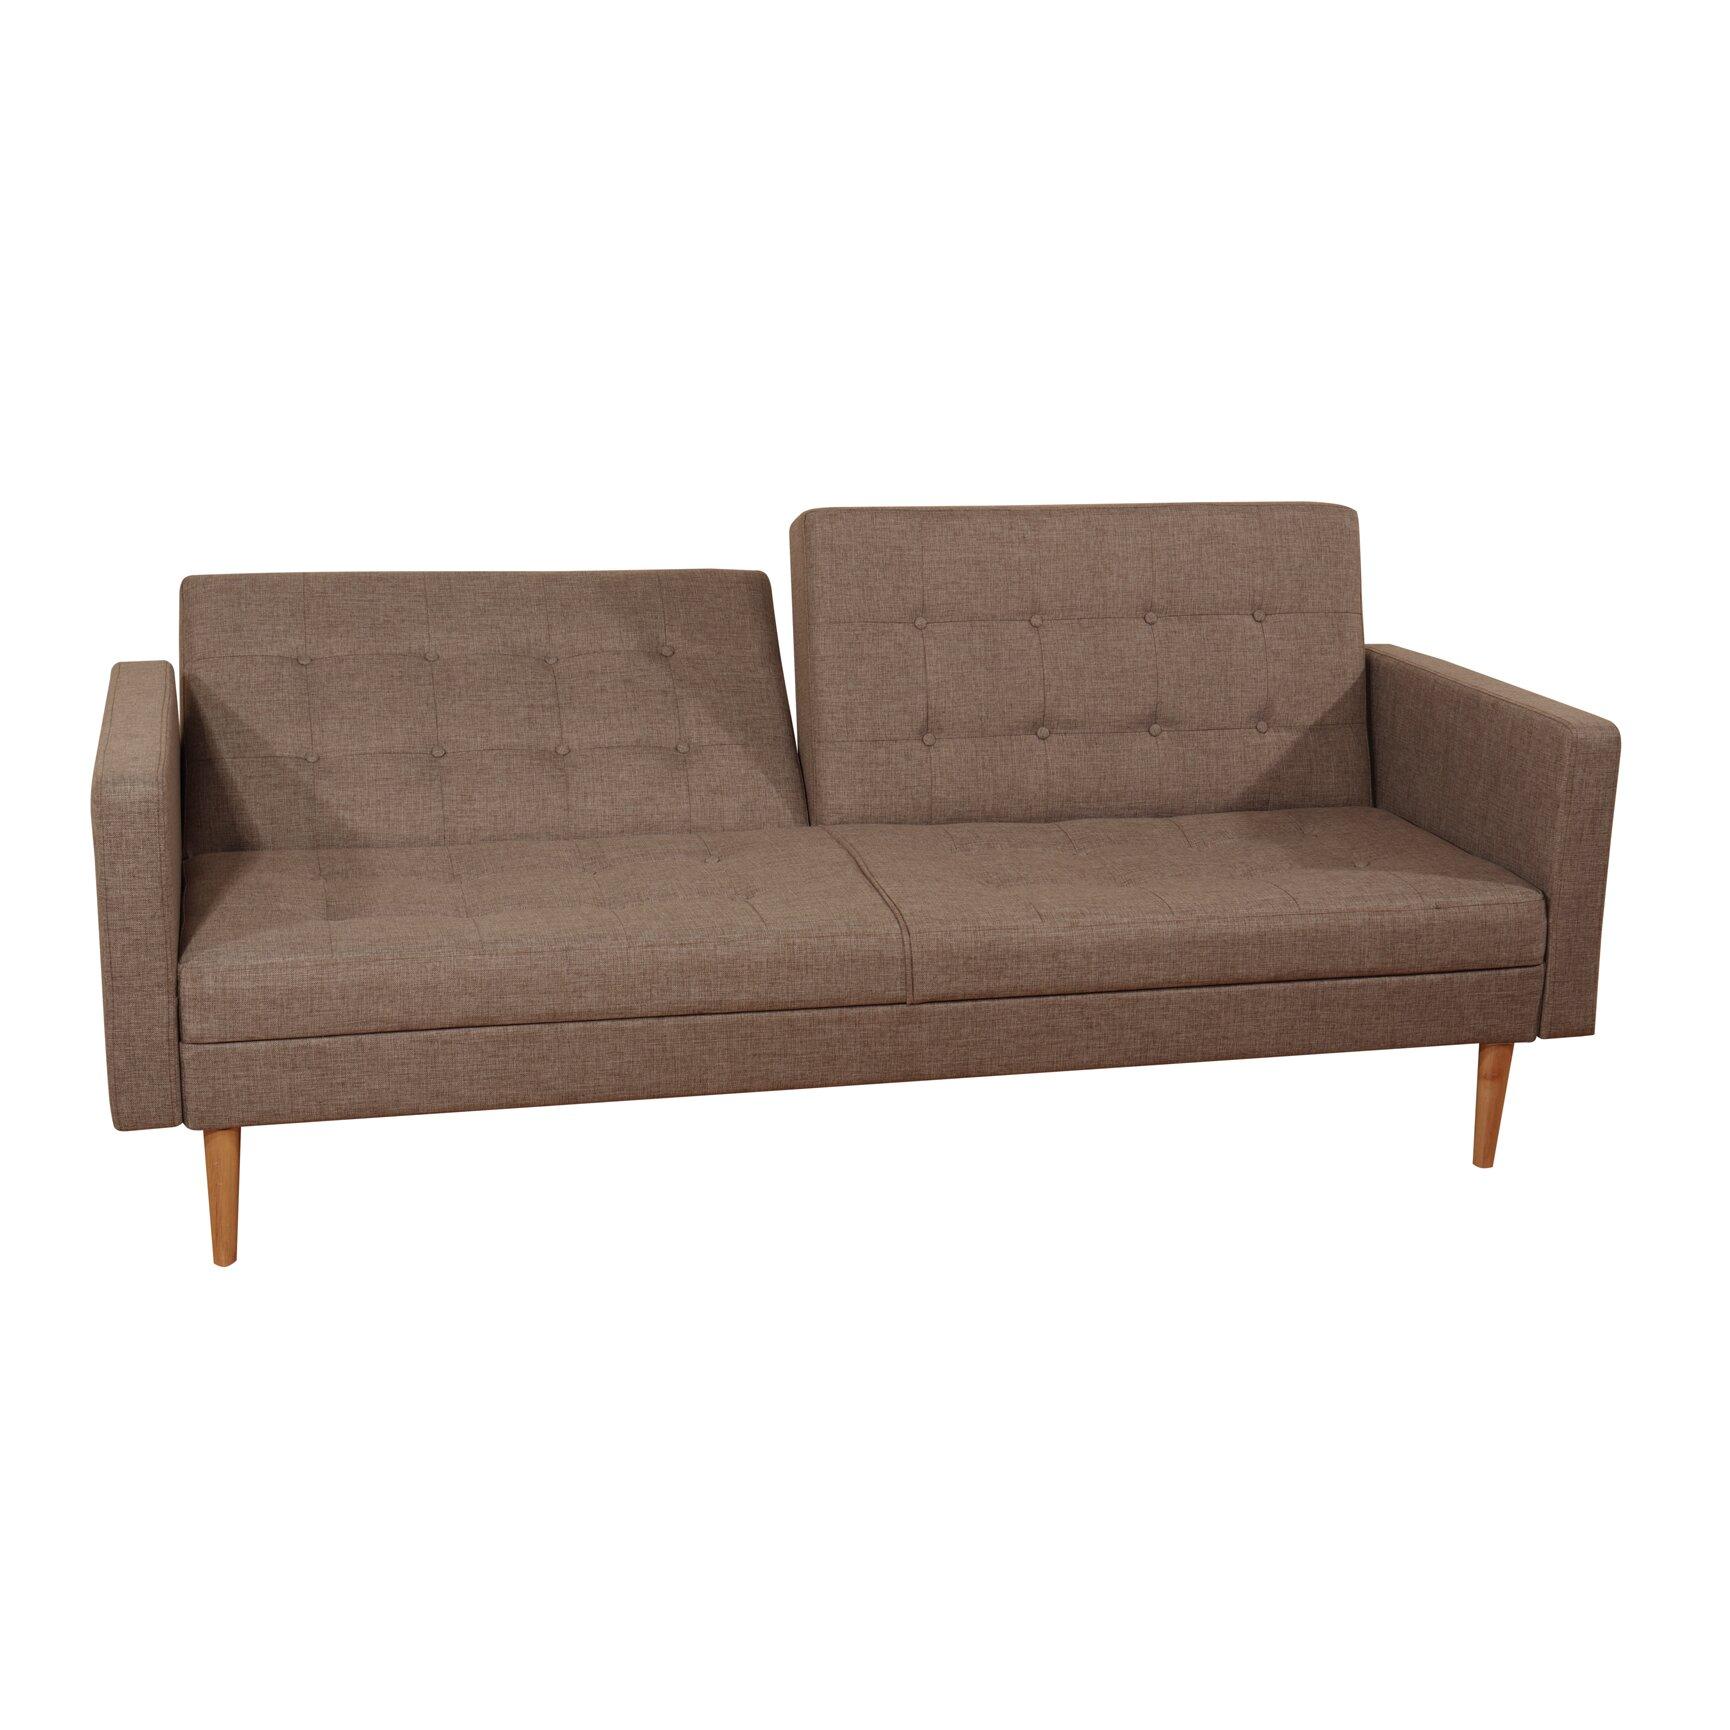 mercury row gaius 3 seater clic clac sofa bed reviews. Black Bedroom Furniture Sets. Home Design Ideas